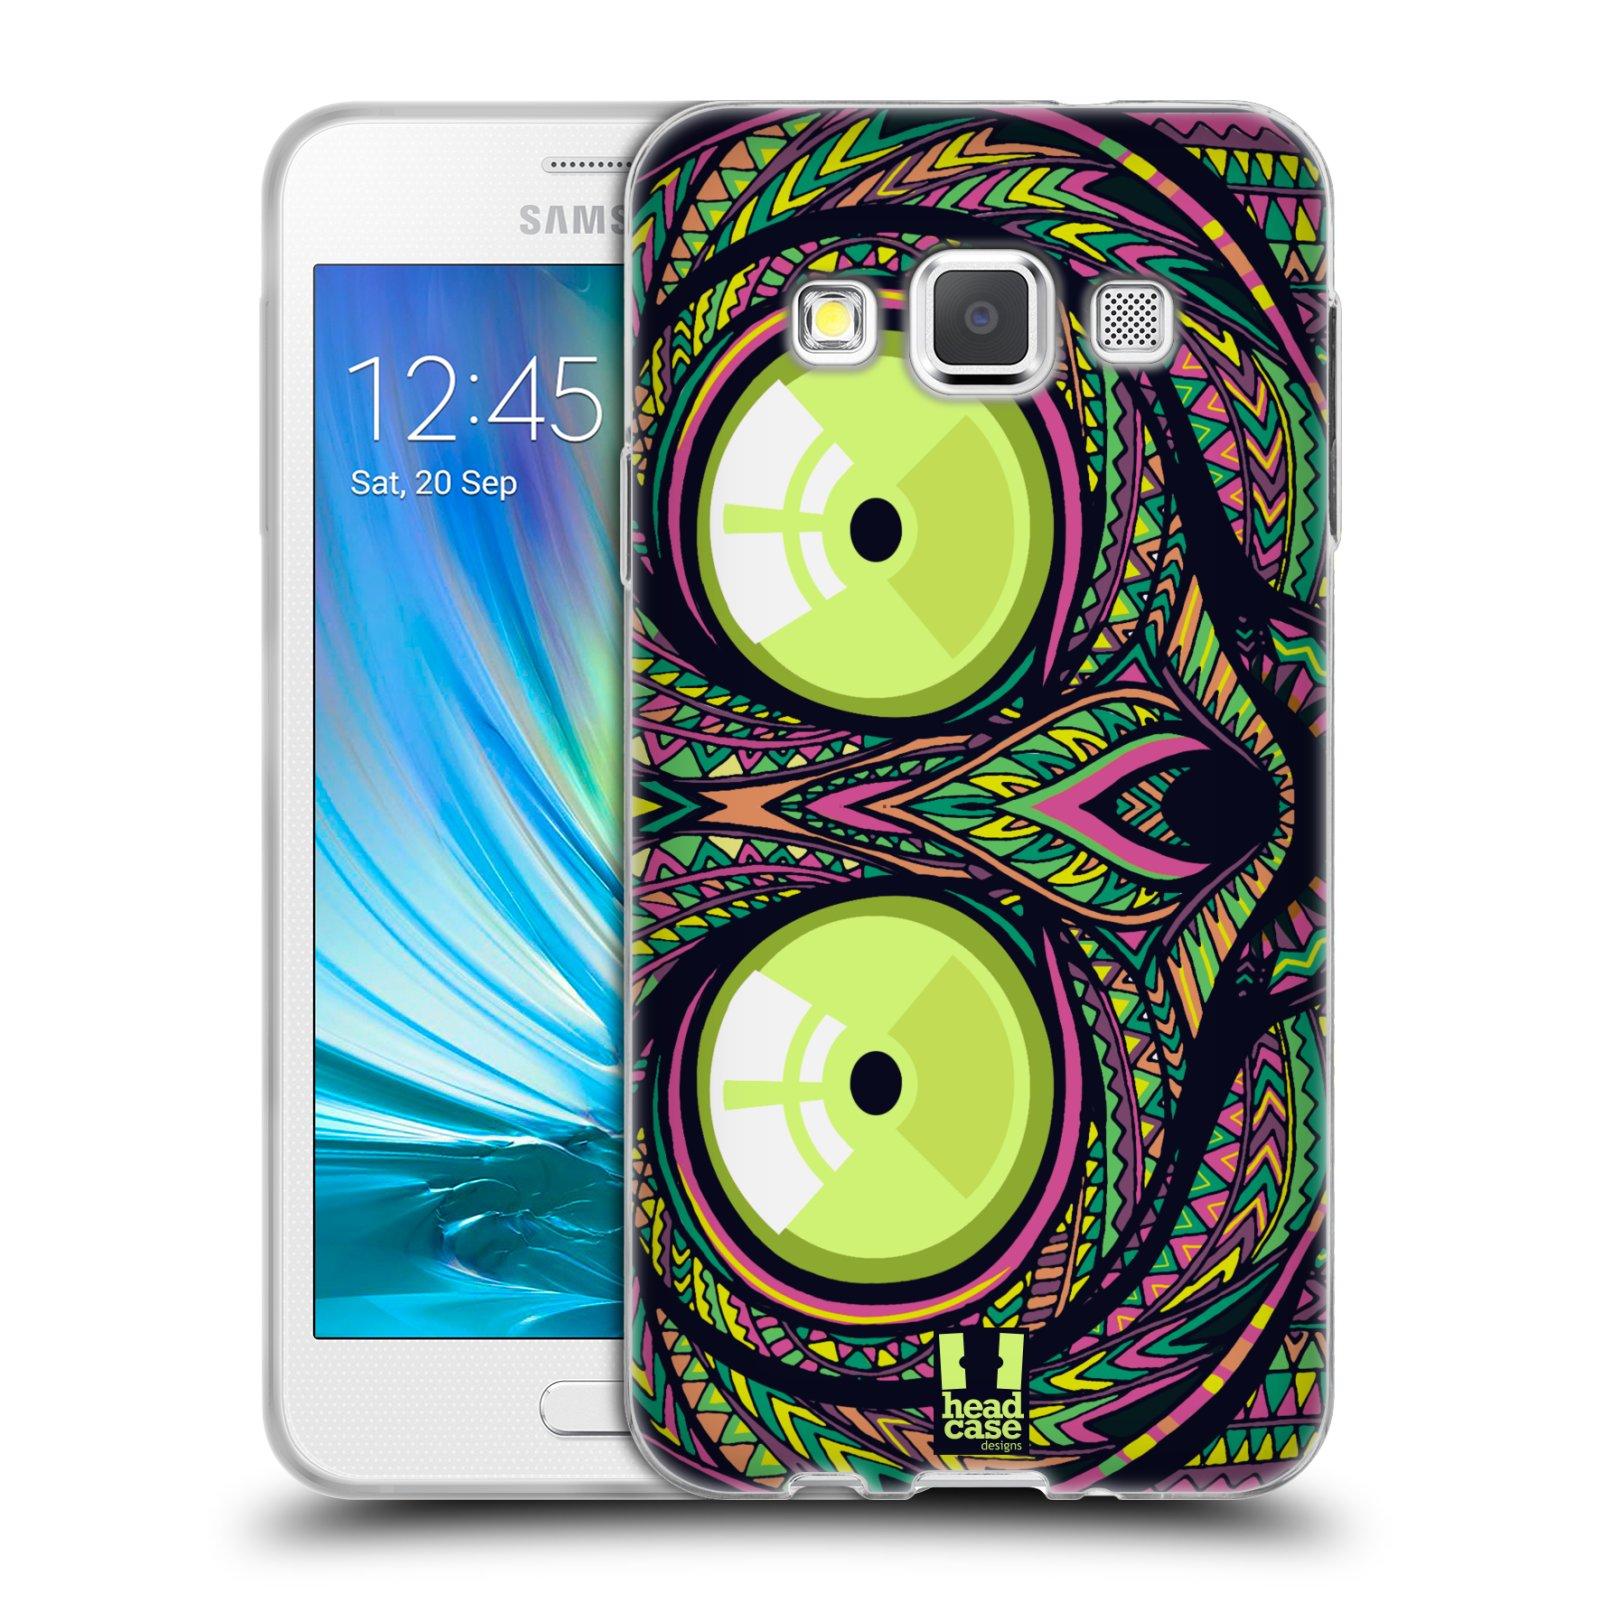 Silikonové pouzdro na mobil Samsung Galaxy A3 HEAD CASE AZTEC NÁRTOUN